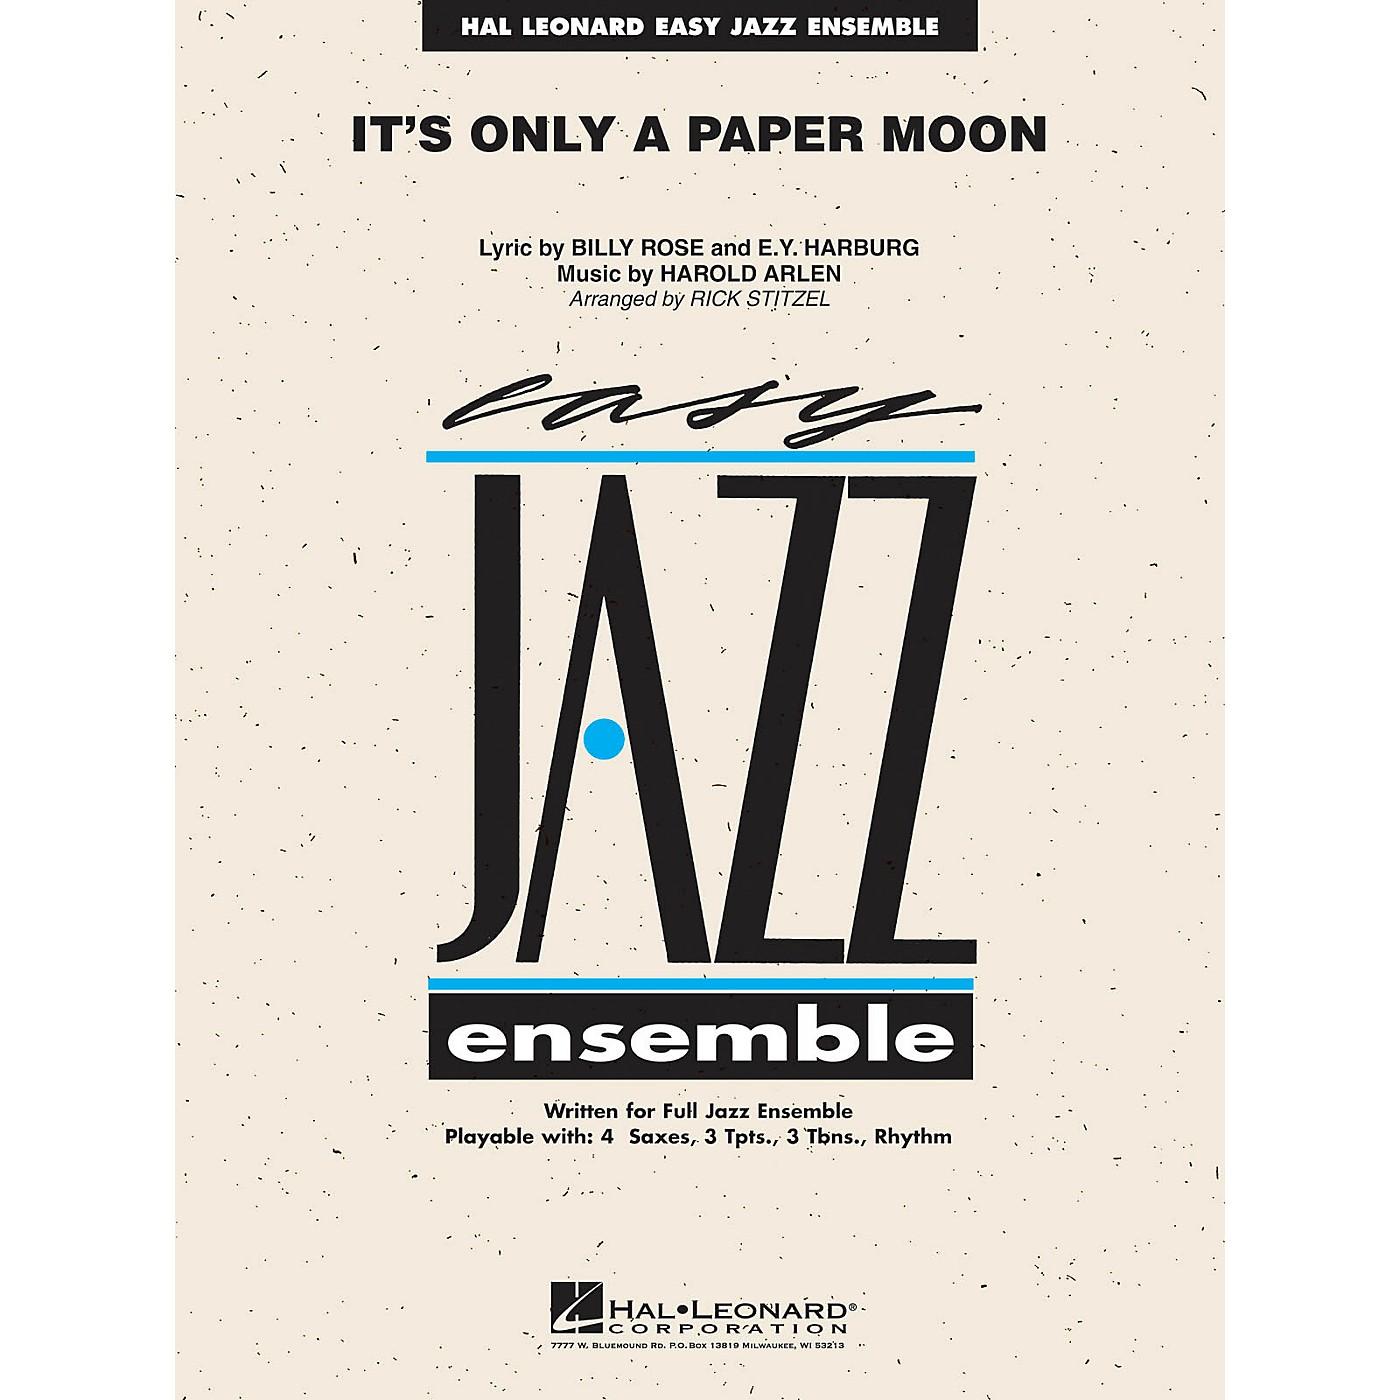 Hal Leonard It's Only a Paper Moon Jazz Band Level 2 Arranged by Rick Stitzel thumbnail